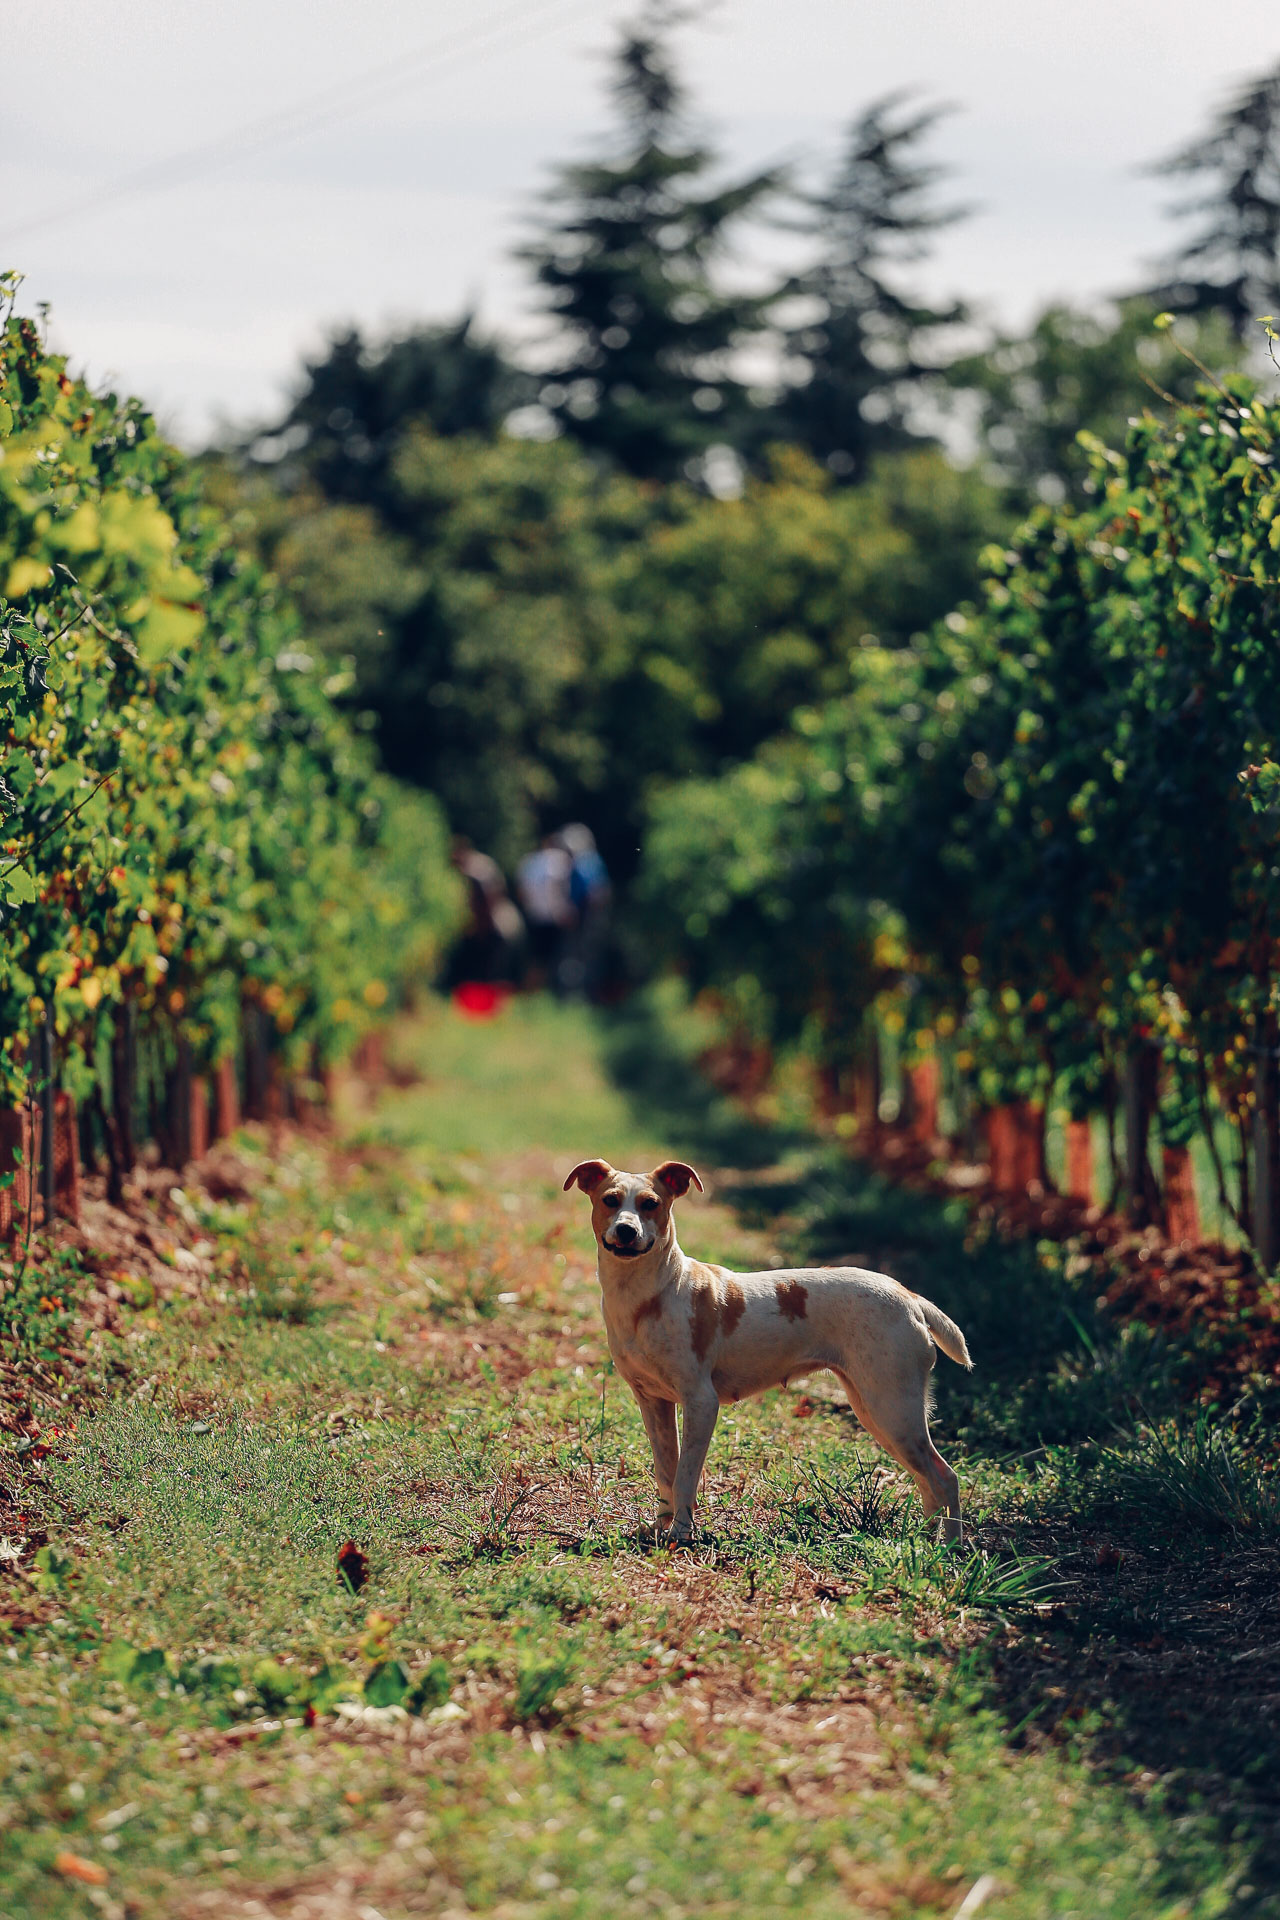 005-Sauro-maule-wineyards-organic-harvest-2016-_RUI7218_p_Lr_web_HD